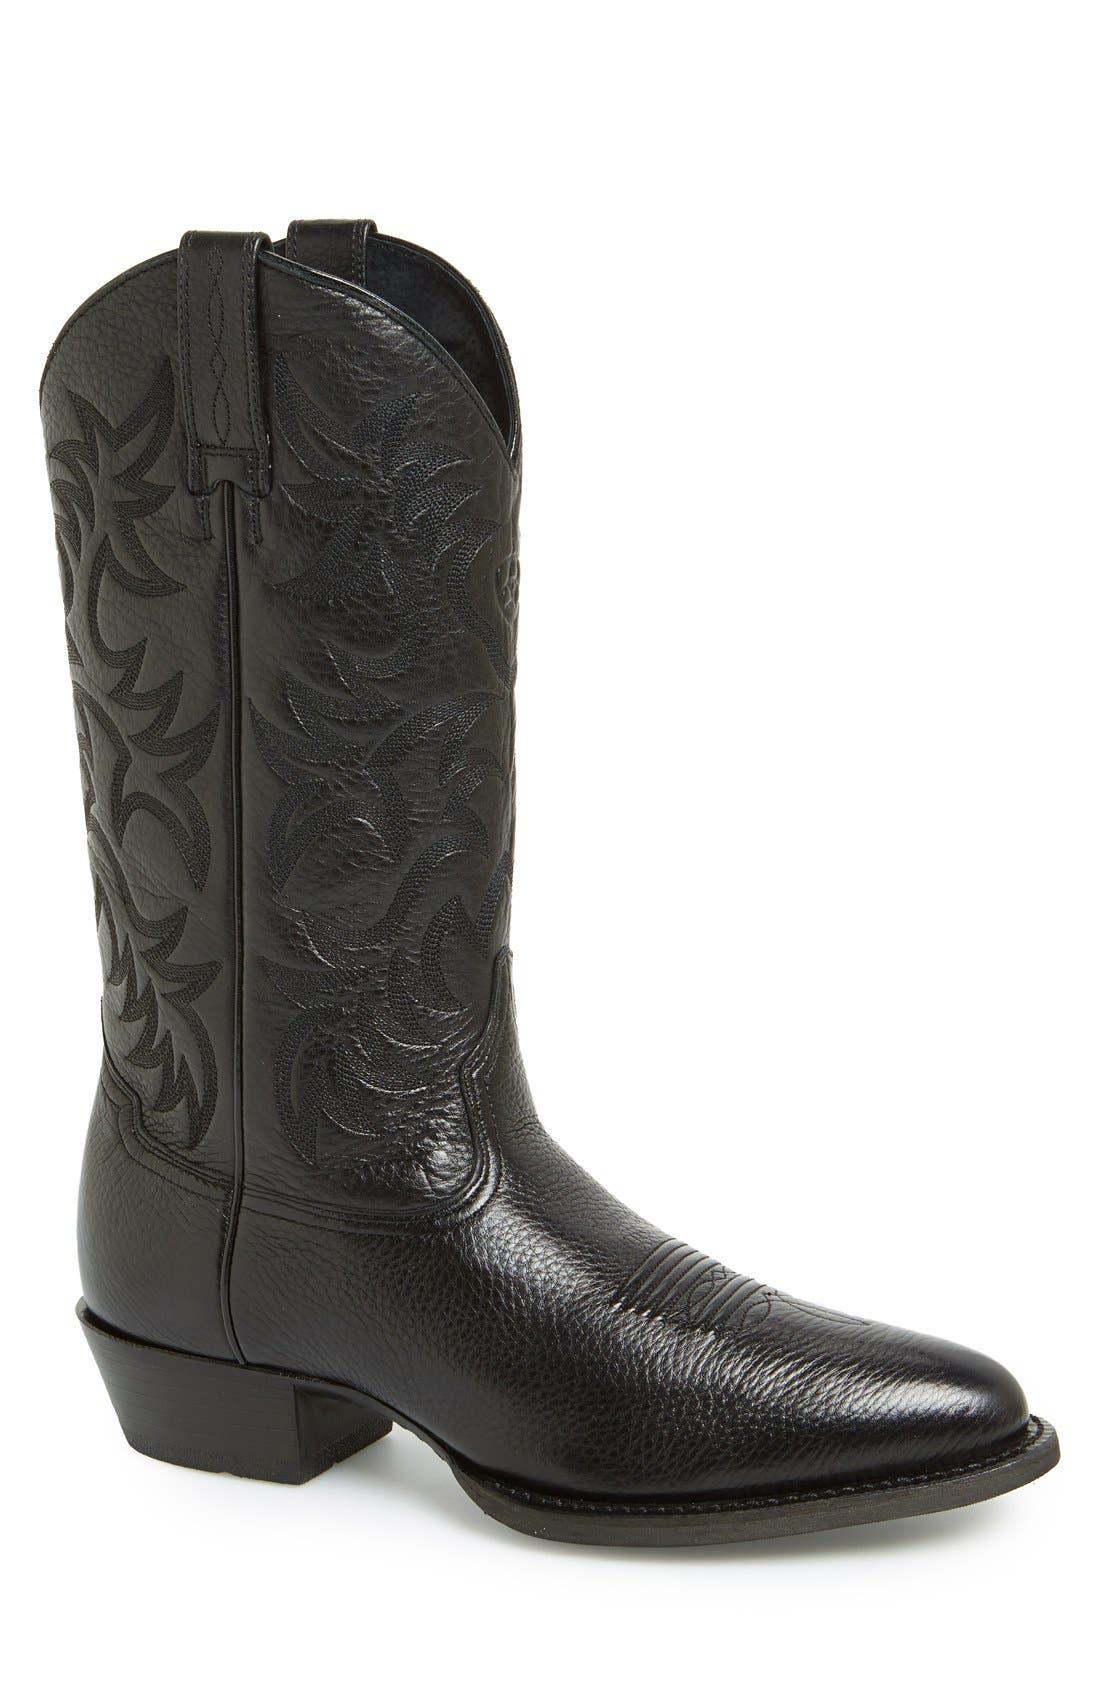 ARIAT, 'Heritage' Leather Cowboy R-Toe Boot, Main thumbnail 1, color, BLACK DEERTAN